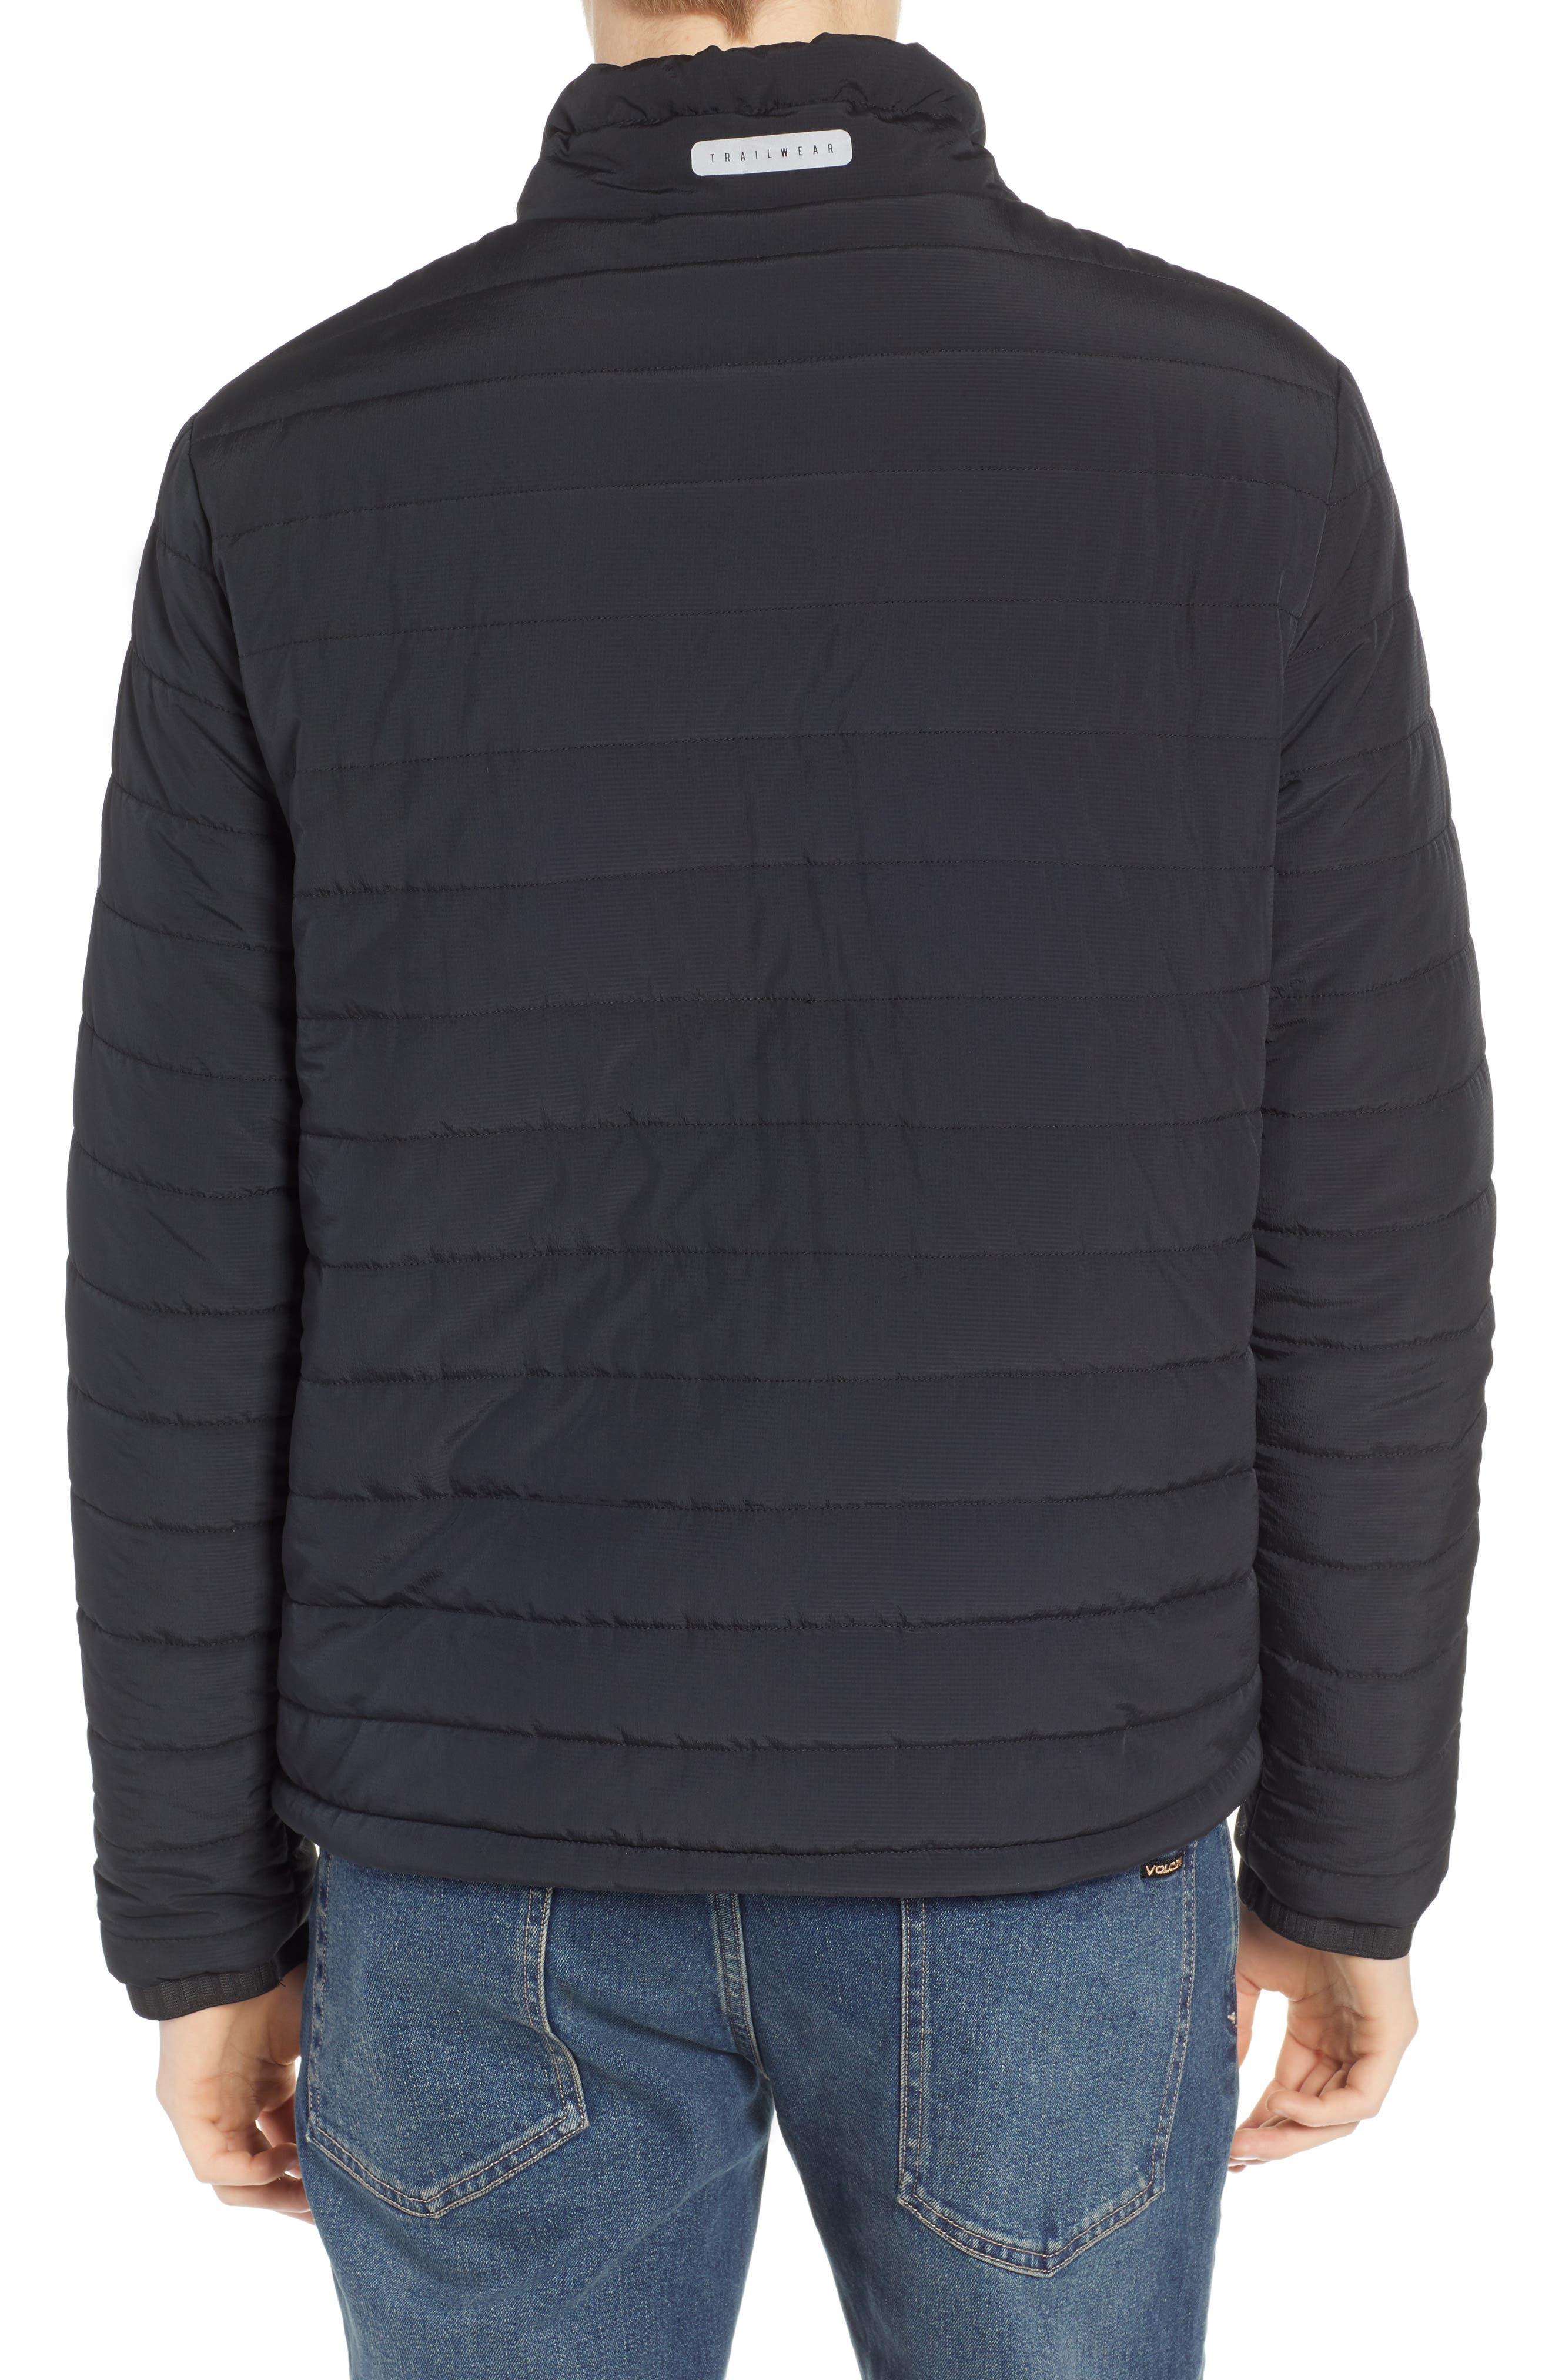 Torbert Jacket,                             Alternate thumbnail 2, color,                             BLACK